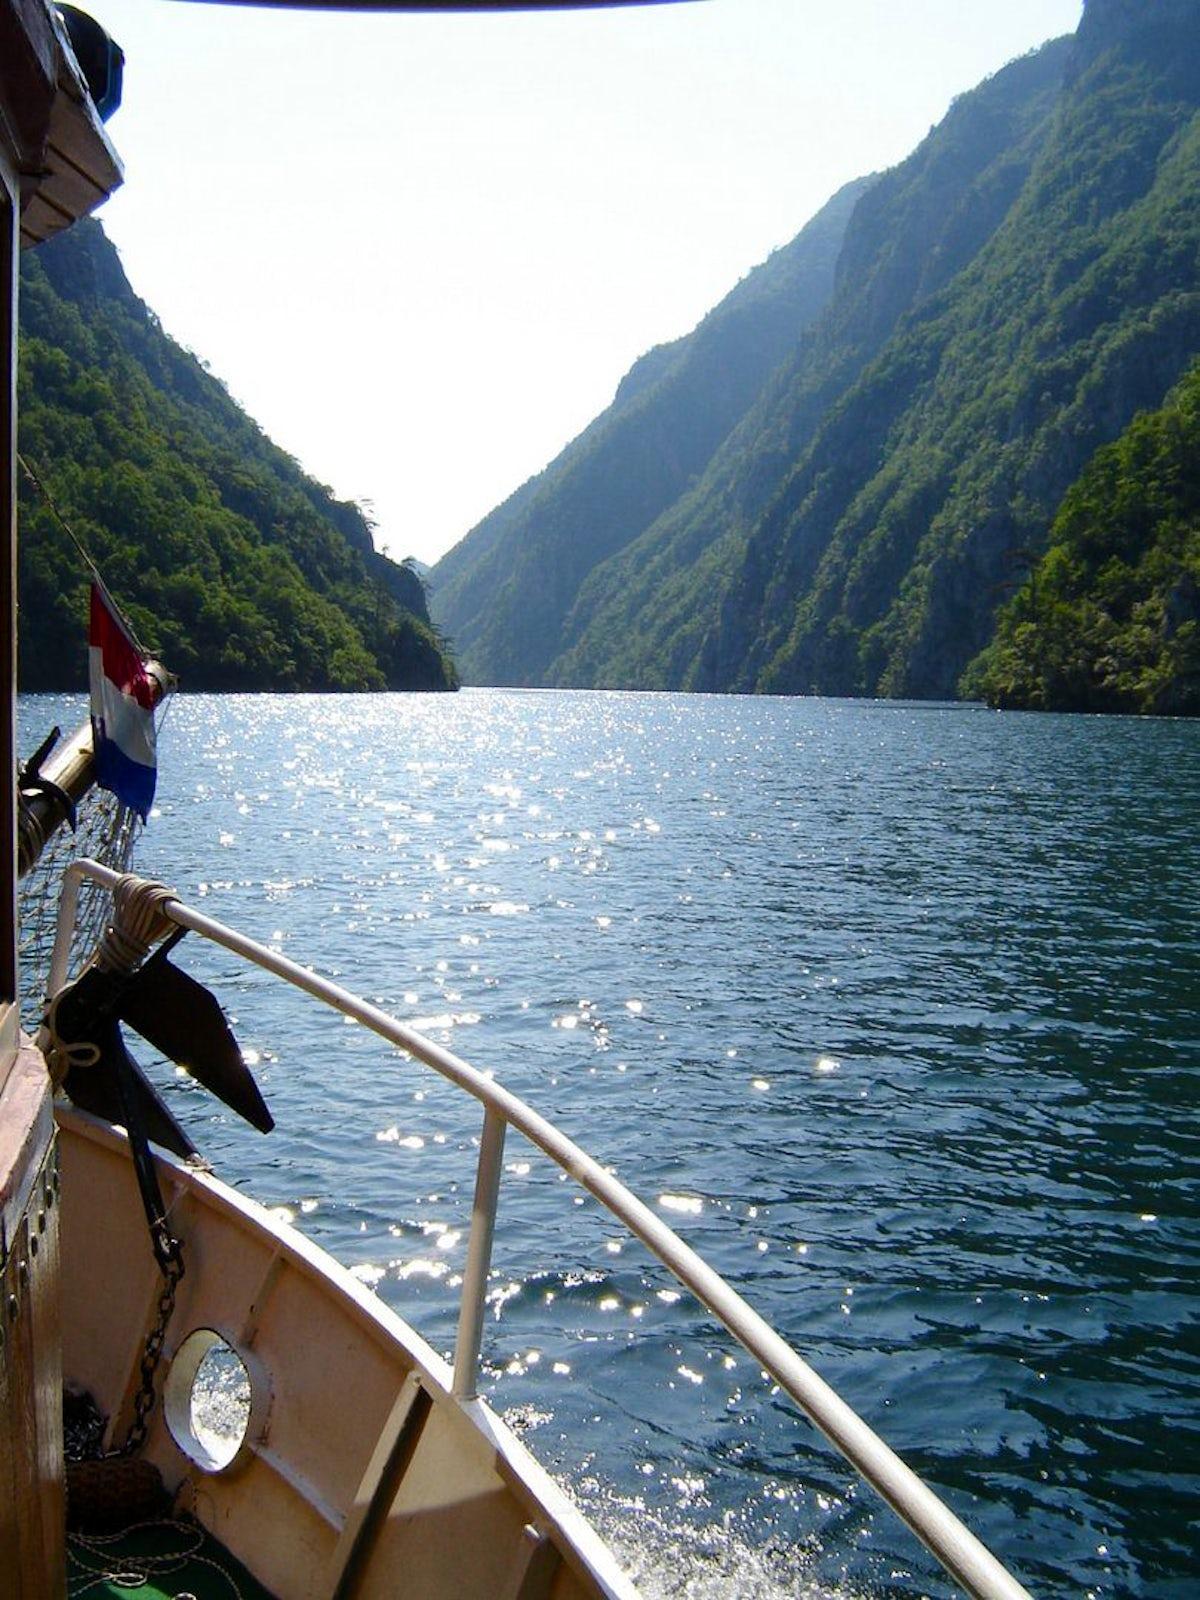 Explore the jewels of Višegrad by boat & train